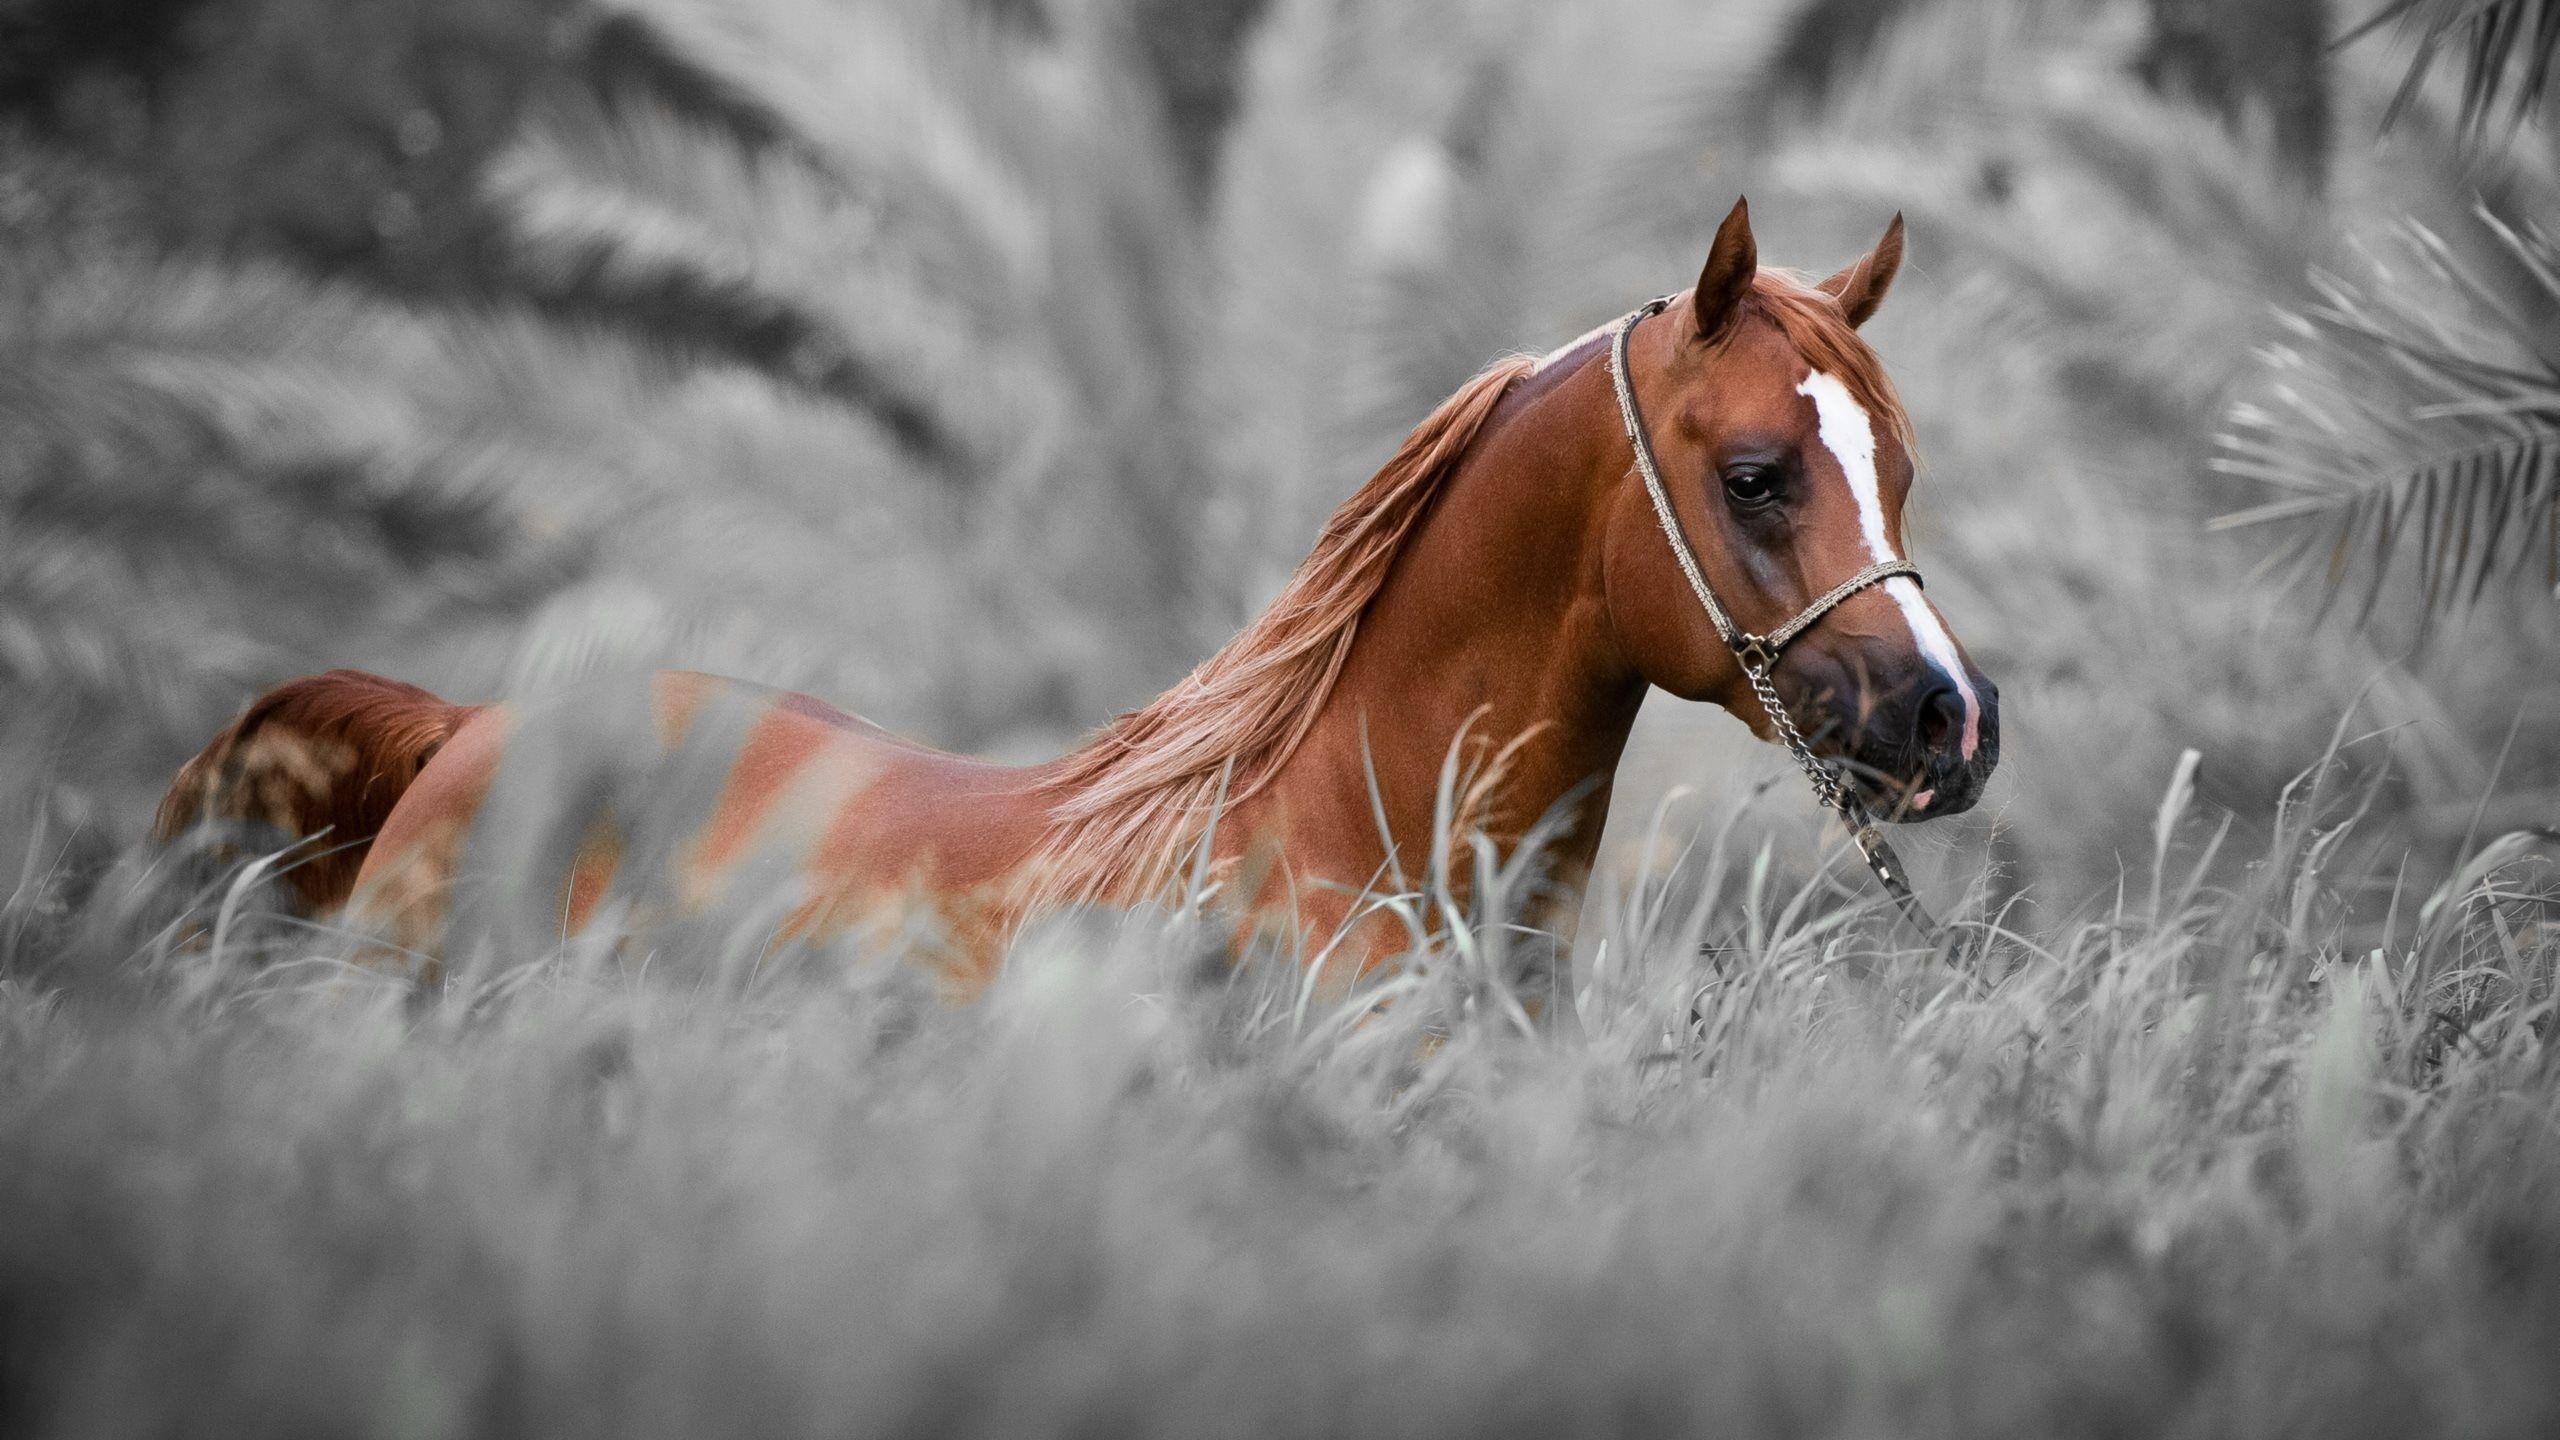 horse wallpaper hd | horse wallpapers hd | Horse wallpaper | Pinterest | Horse wallpaper, Horses ...